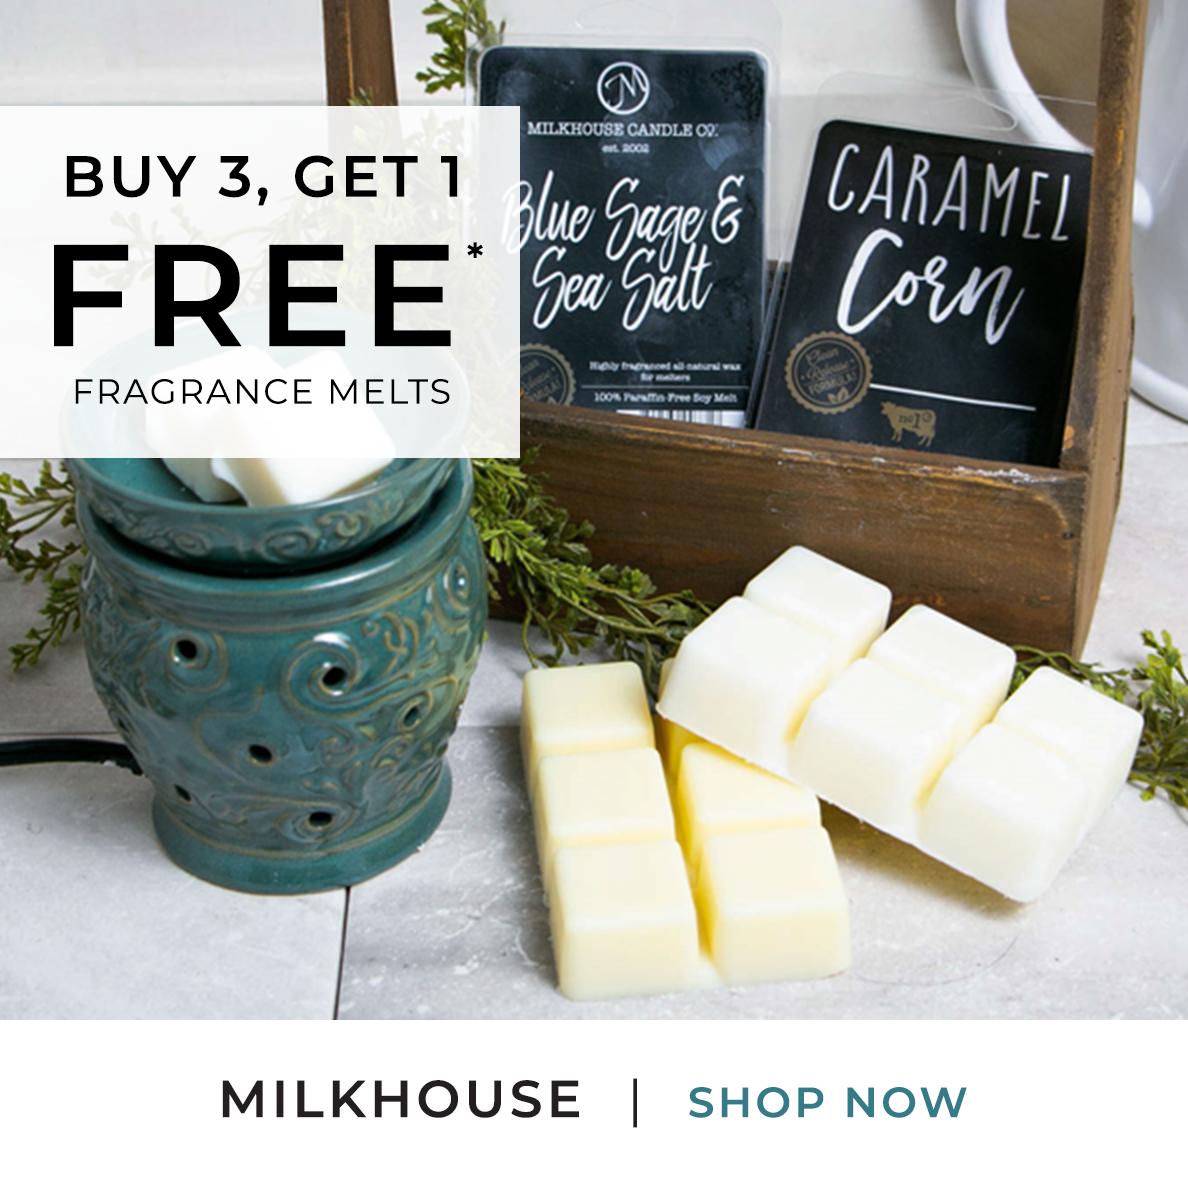 Milkhouse - Fragrance Melts - Buy 3 Get 1 FREE